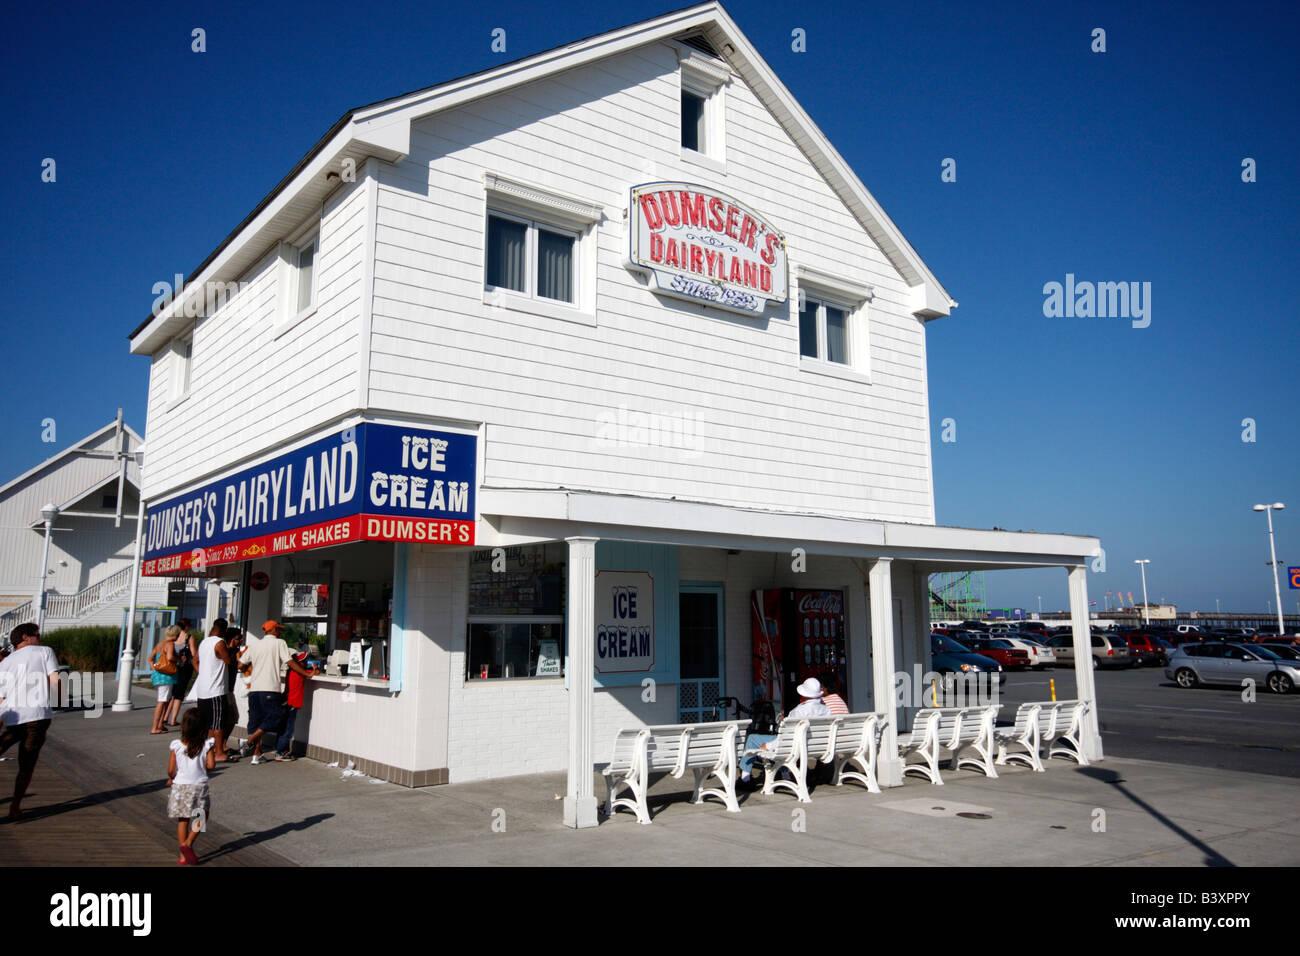 ocean city maryland boardwalk stock photos  amp  ocean city maryland boardwalk stock images alamy